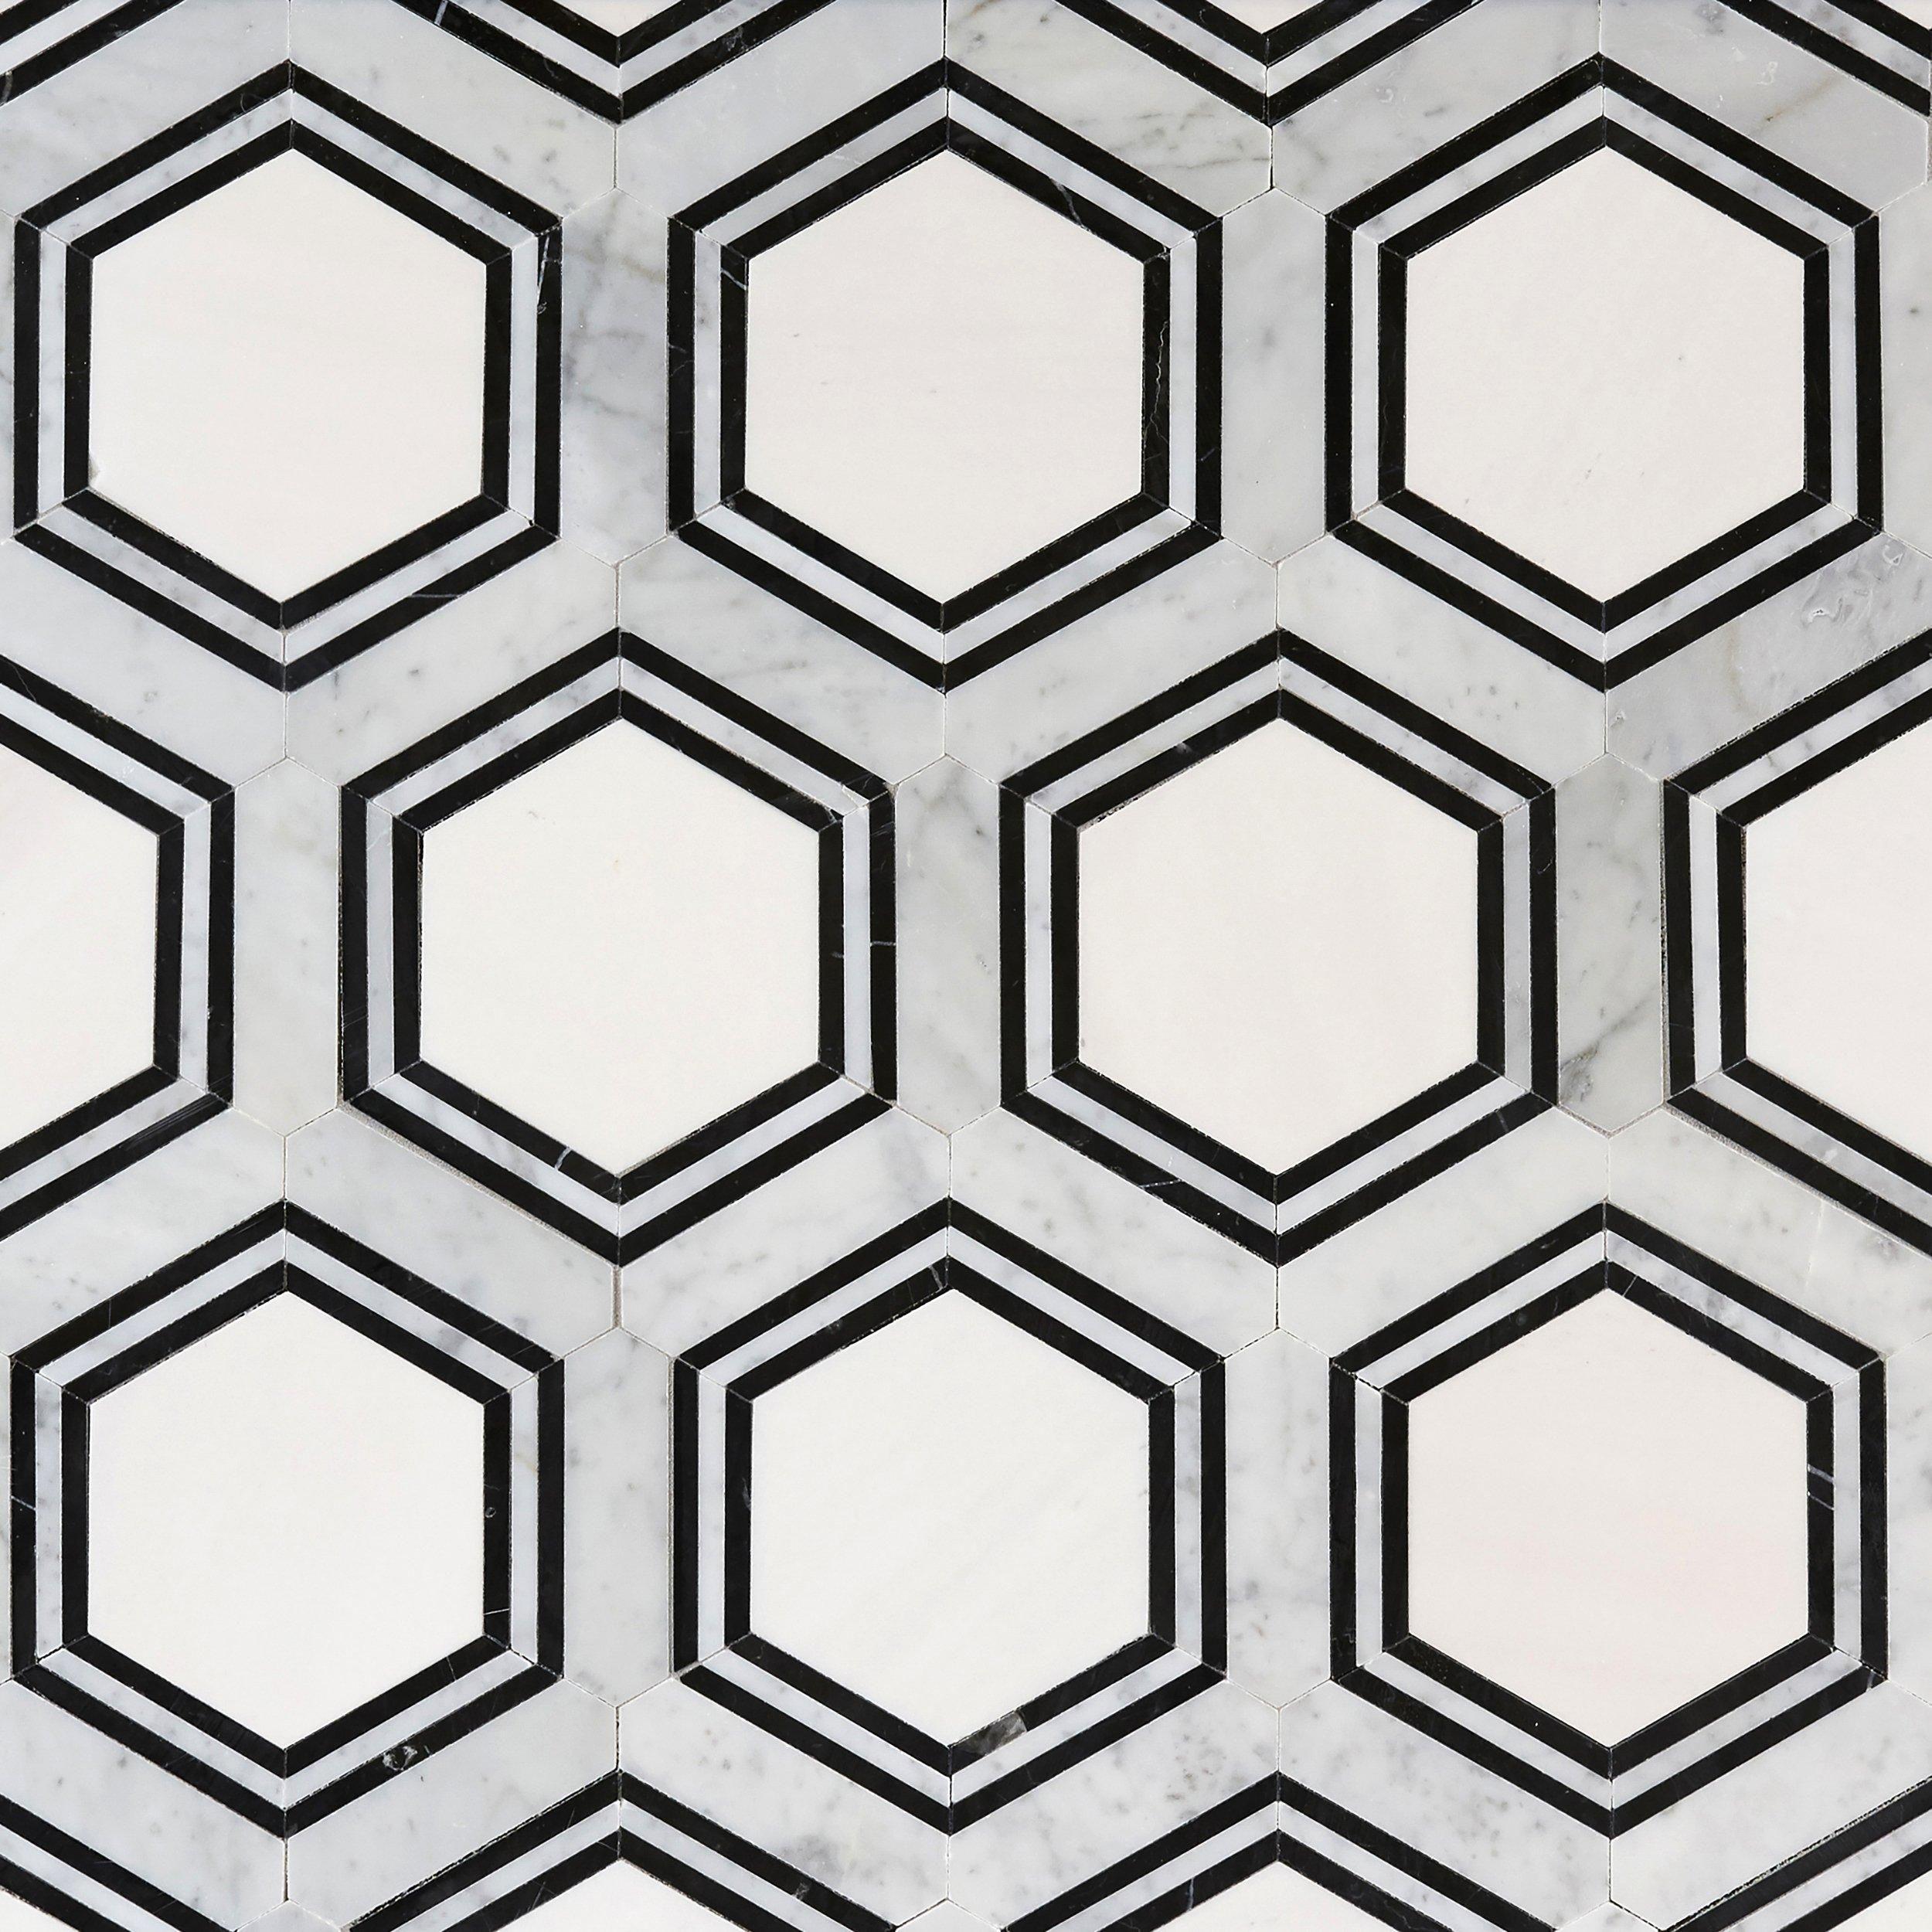 Carrara Thassos Hexagon Waterjet Marble Mosaic Marble